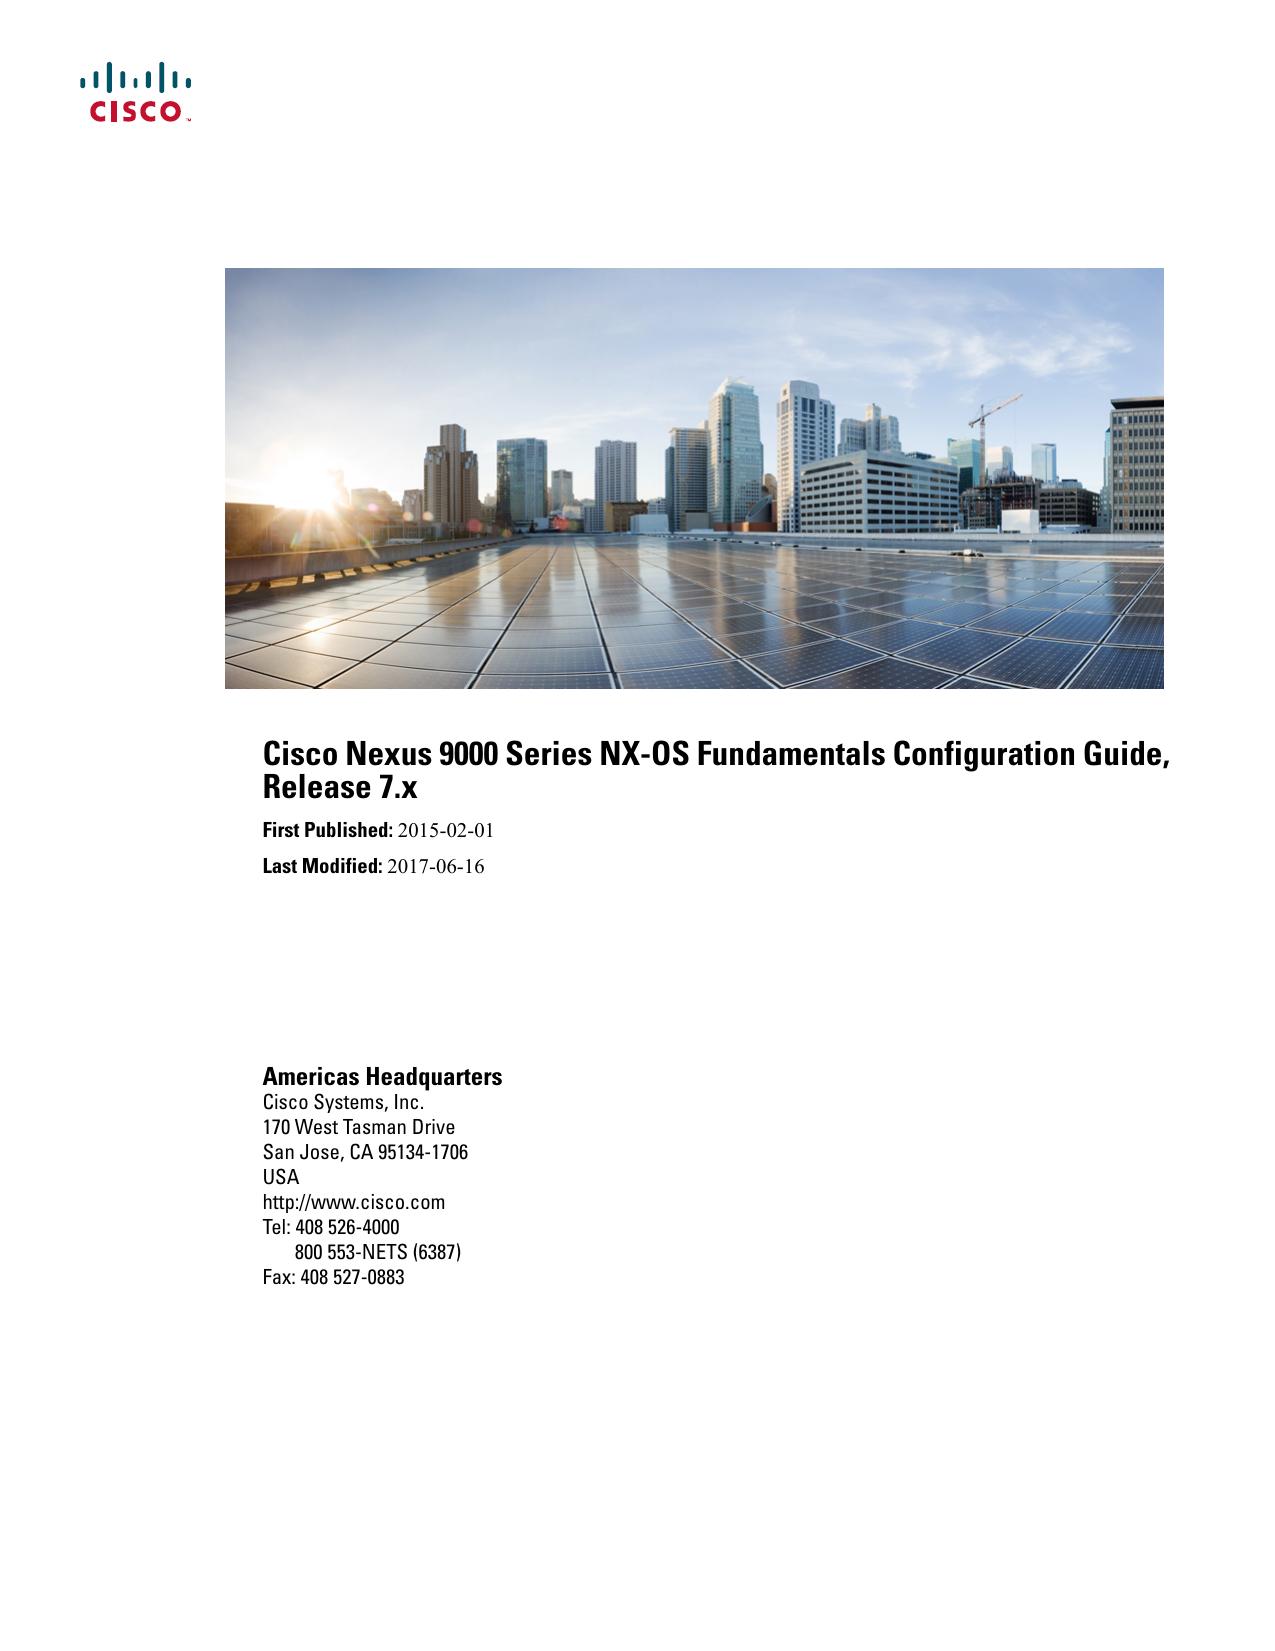 Cisco Nexus 9000 Series NX-OS Fundamentals Configuration